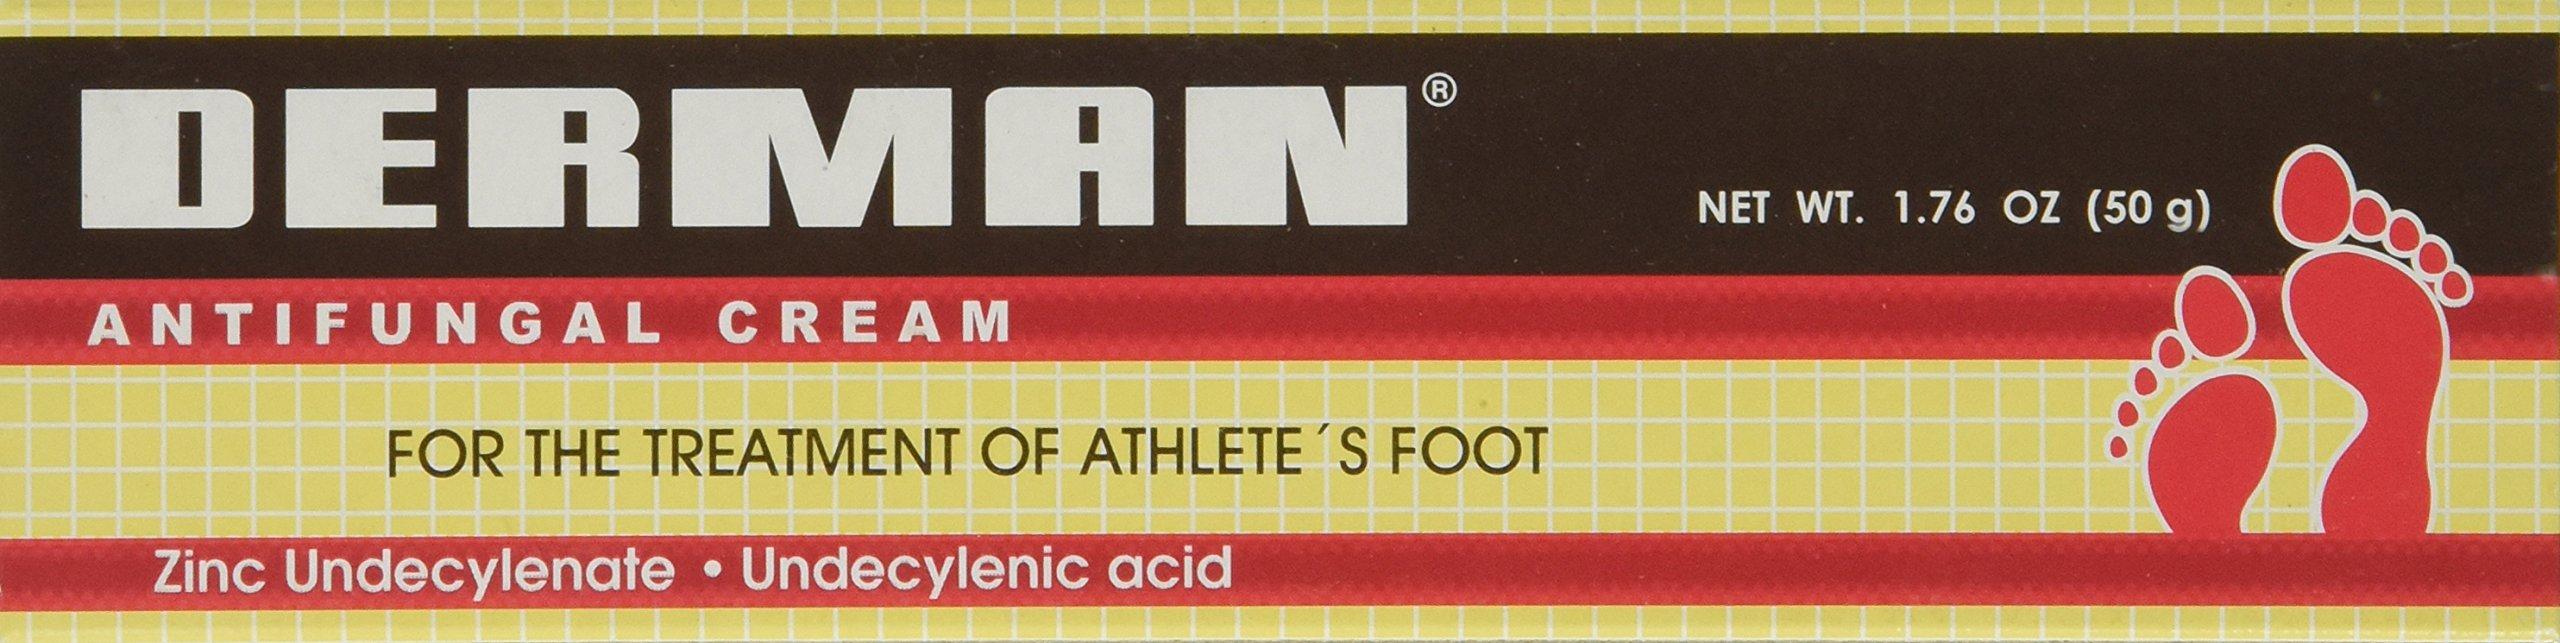 6pk - Derman - Antifungal Cream - 1.76oz